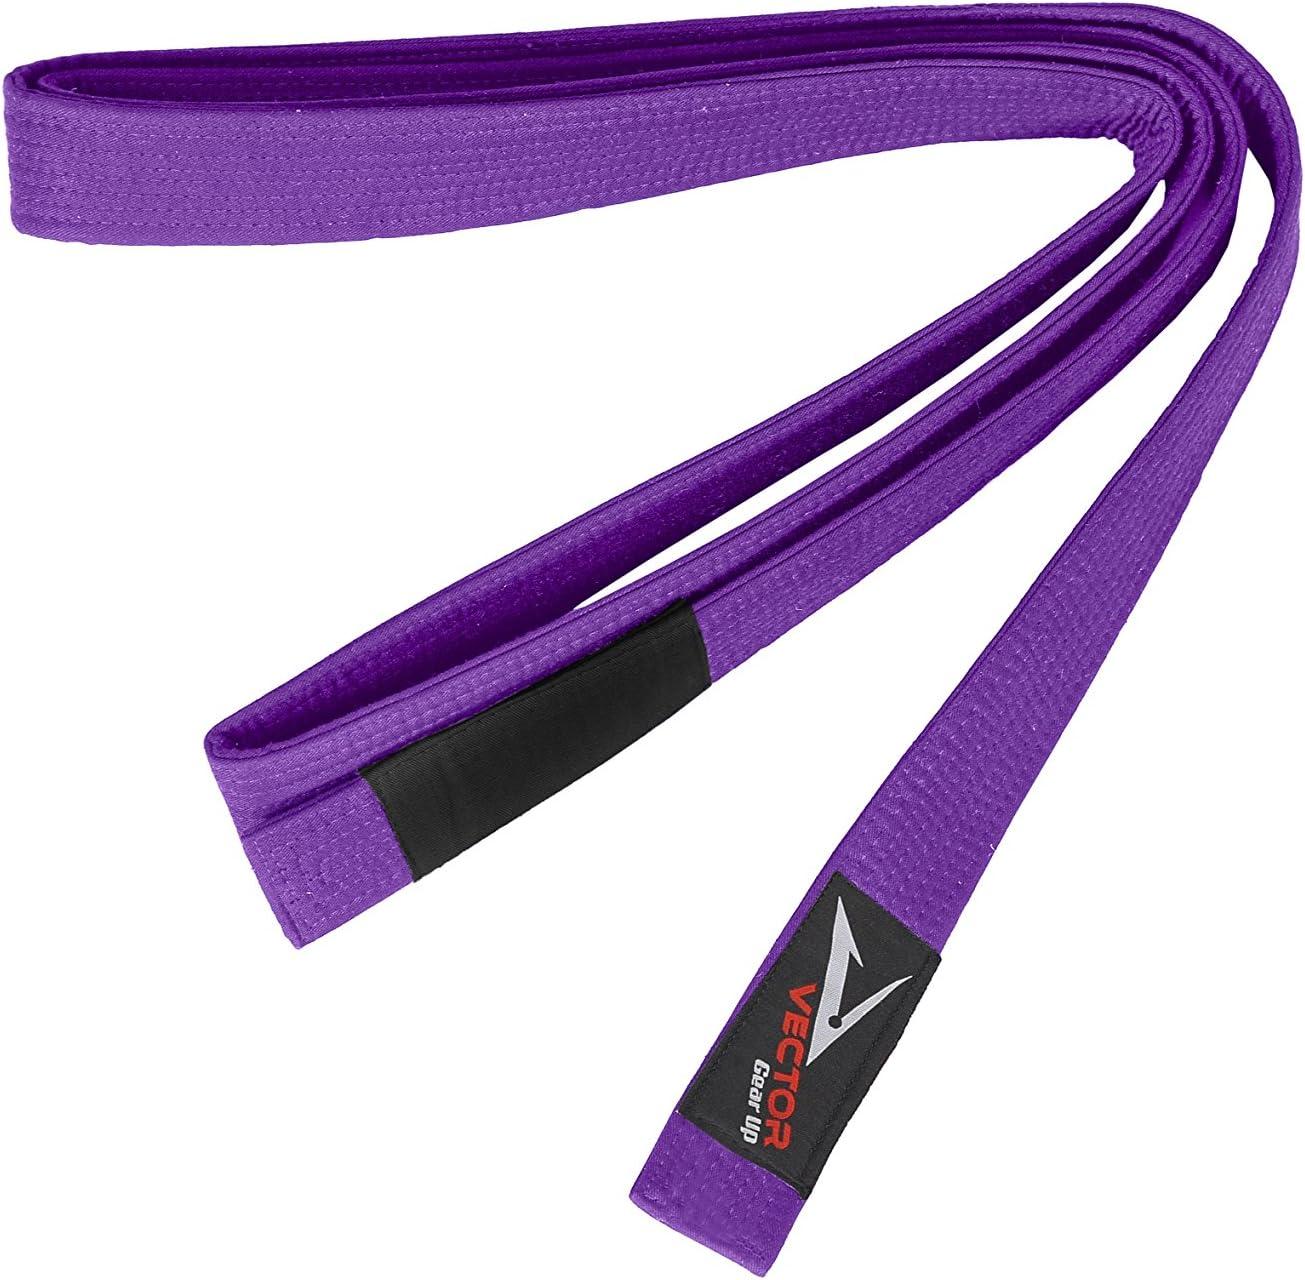 Colores est/ándar brasile/ños Jiu Jitsu Vector Sports Cintur/ón 100/% de algod/ón brasile/ño Jiu Jitsu BJJ Pro